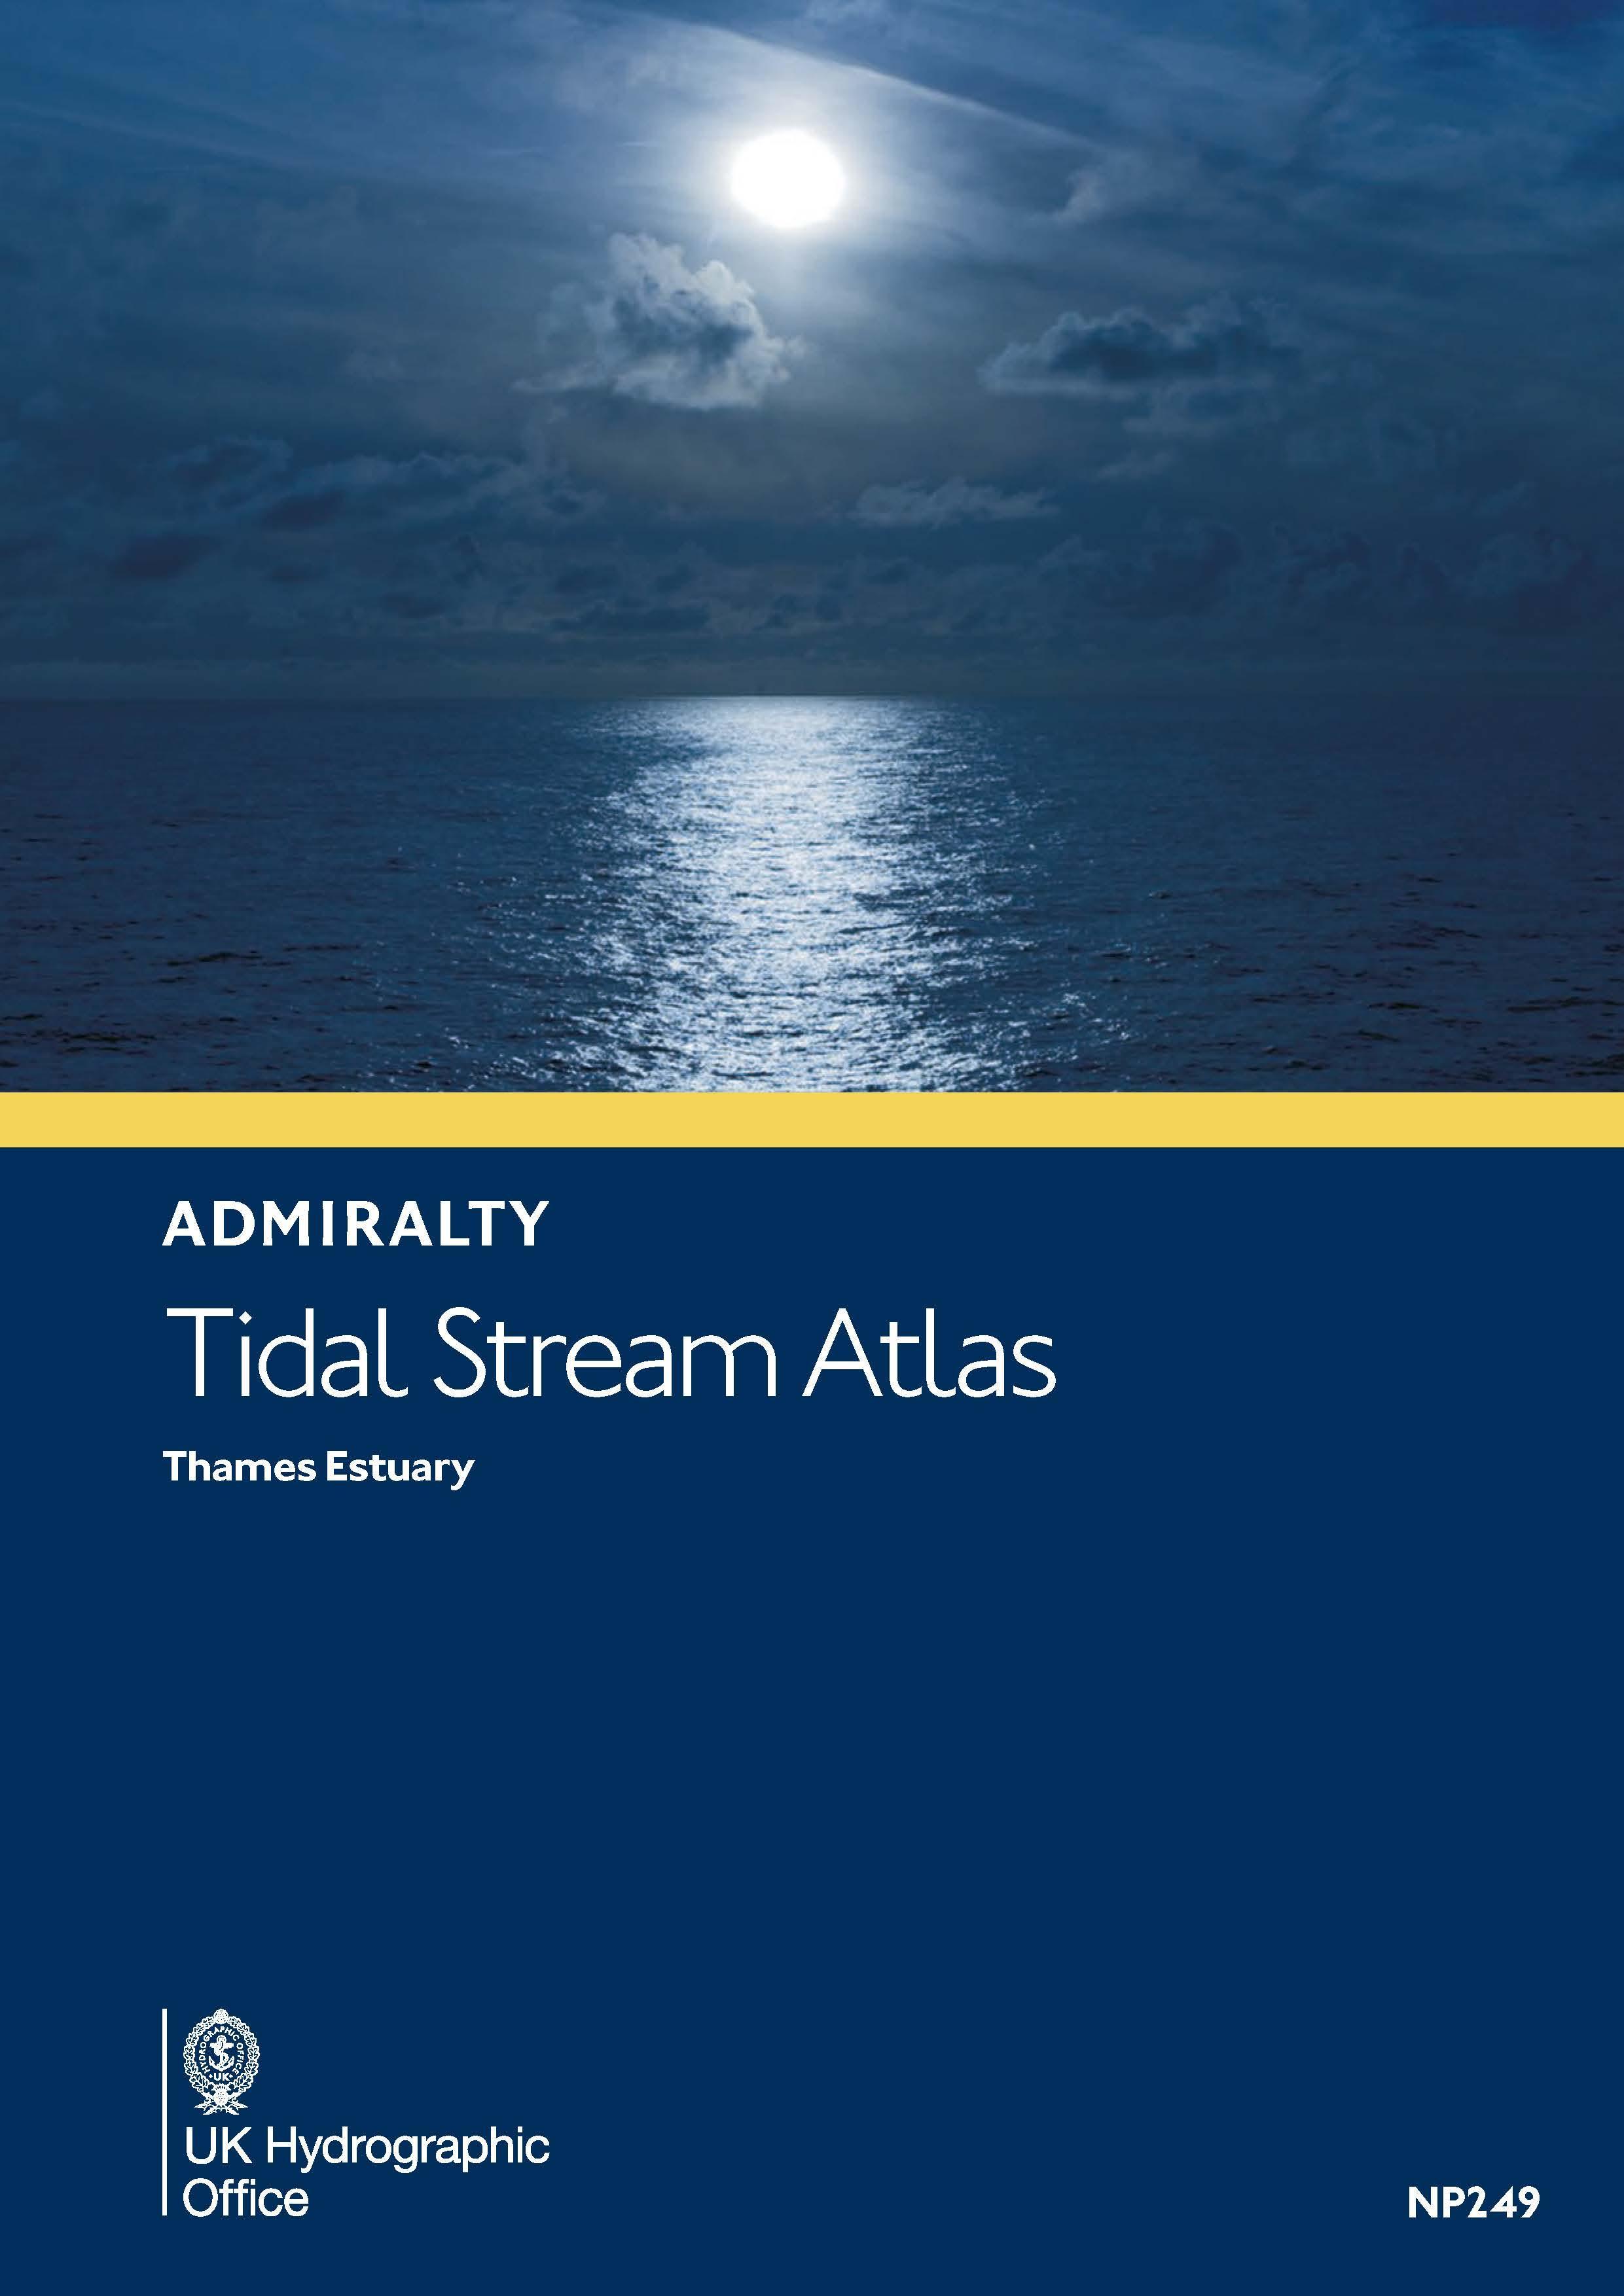 Gezeitenstromatlas NP249 Thames Estuary (with co-tidal charts)